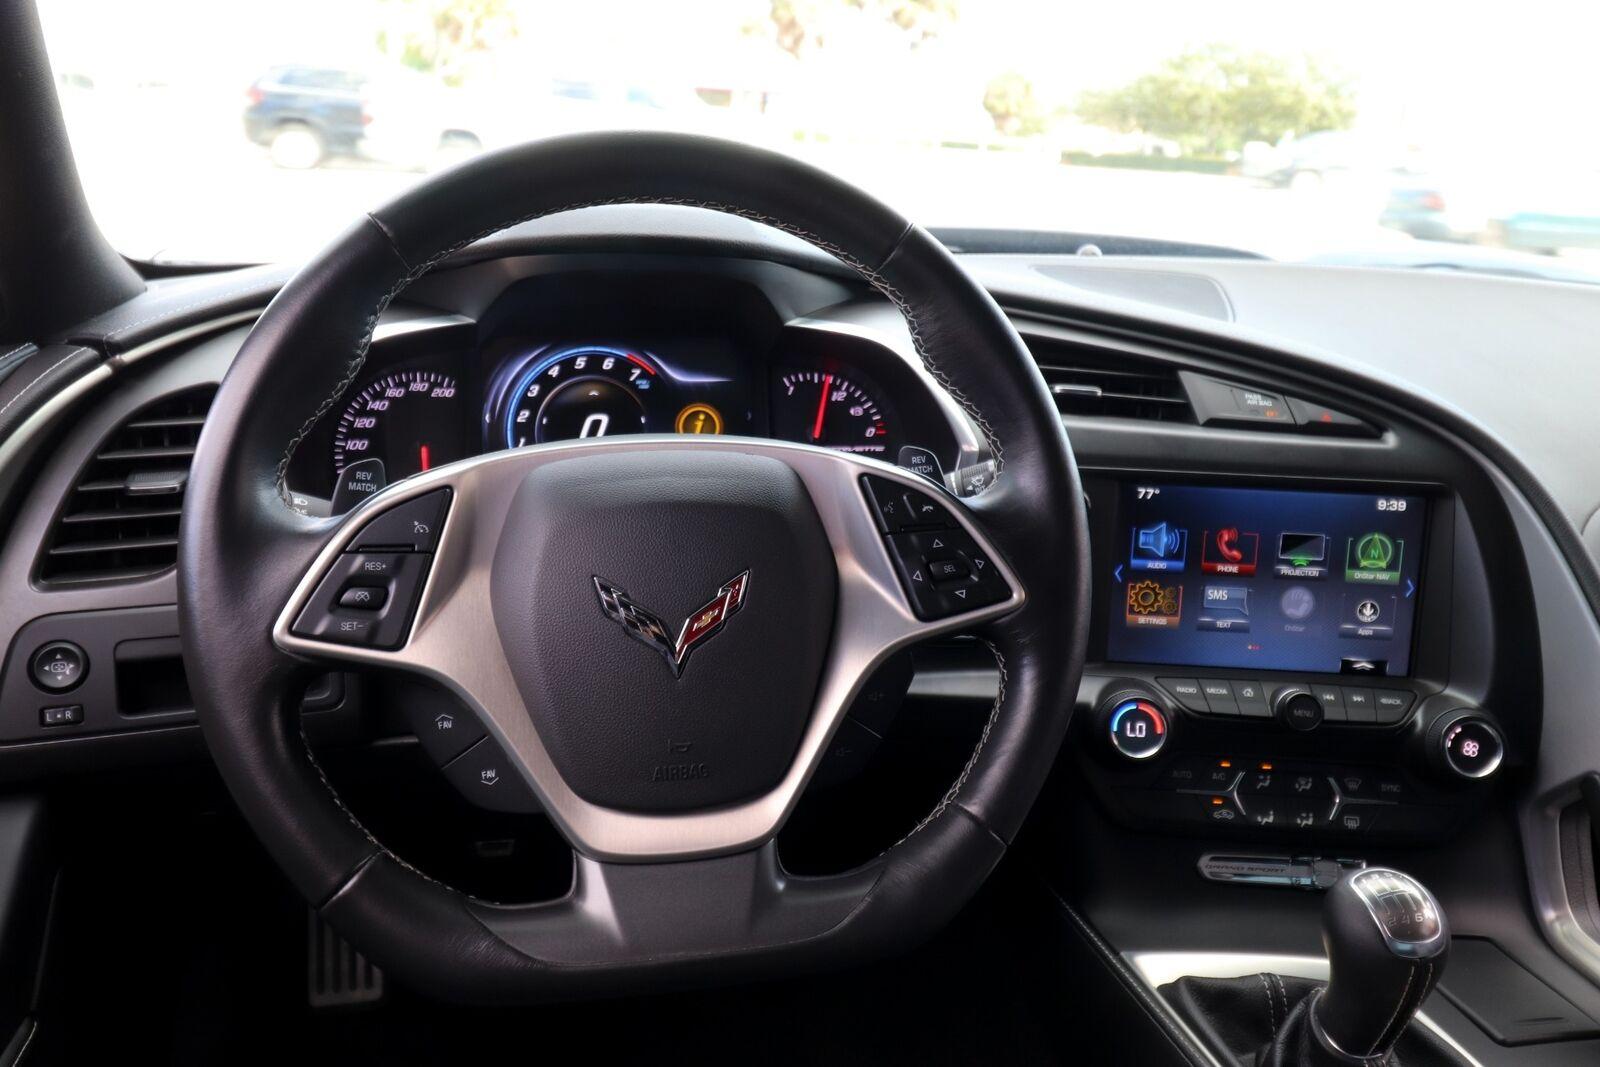 2018 Black Chevrolet Corvette Grand Sport    C7 Corvette Photo 2